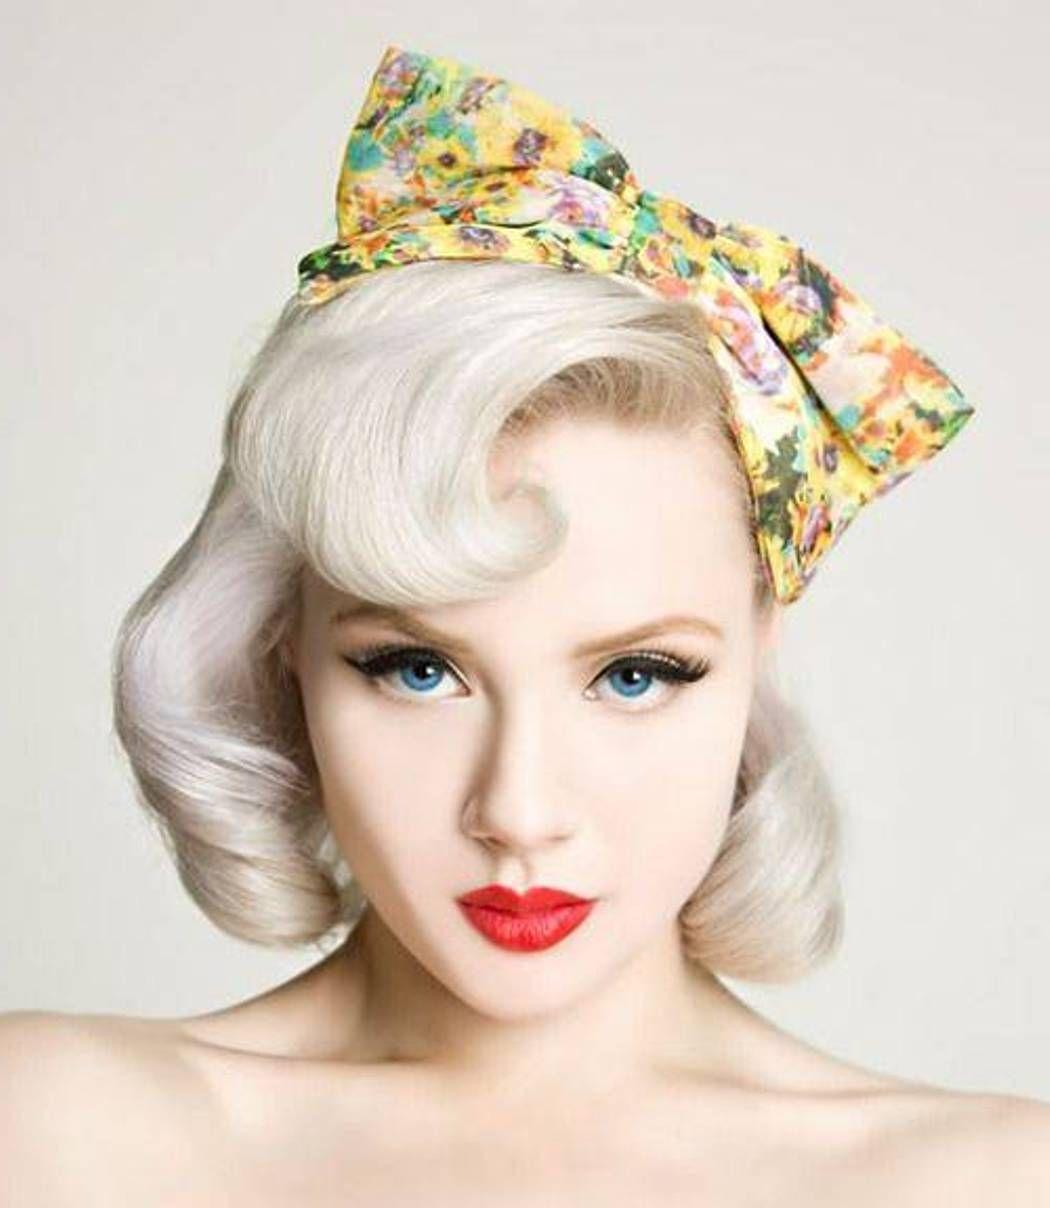 Short Blonde Pin Up Girl Hairstyles cakepins